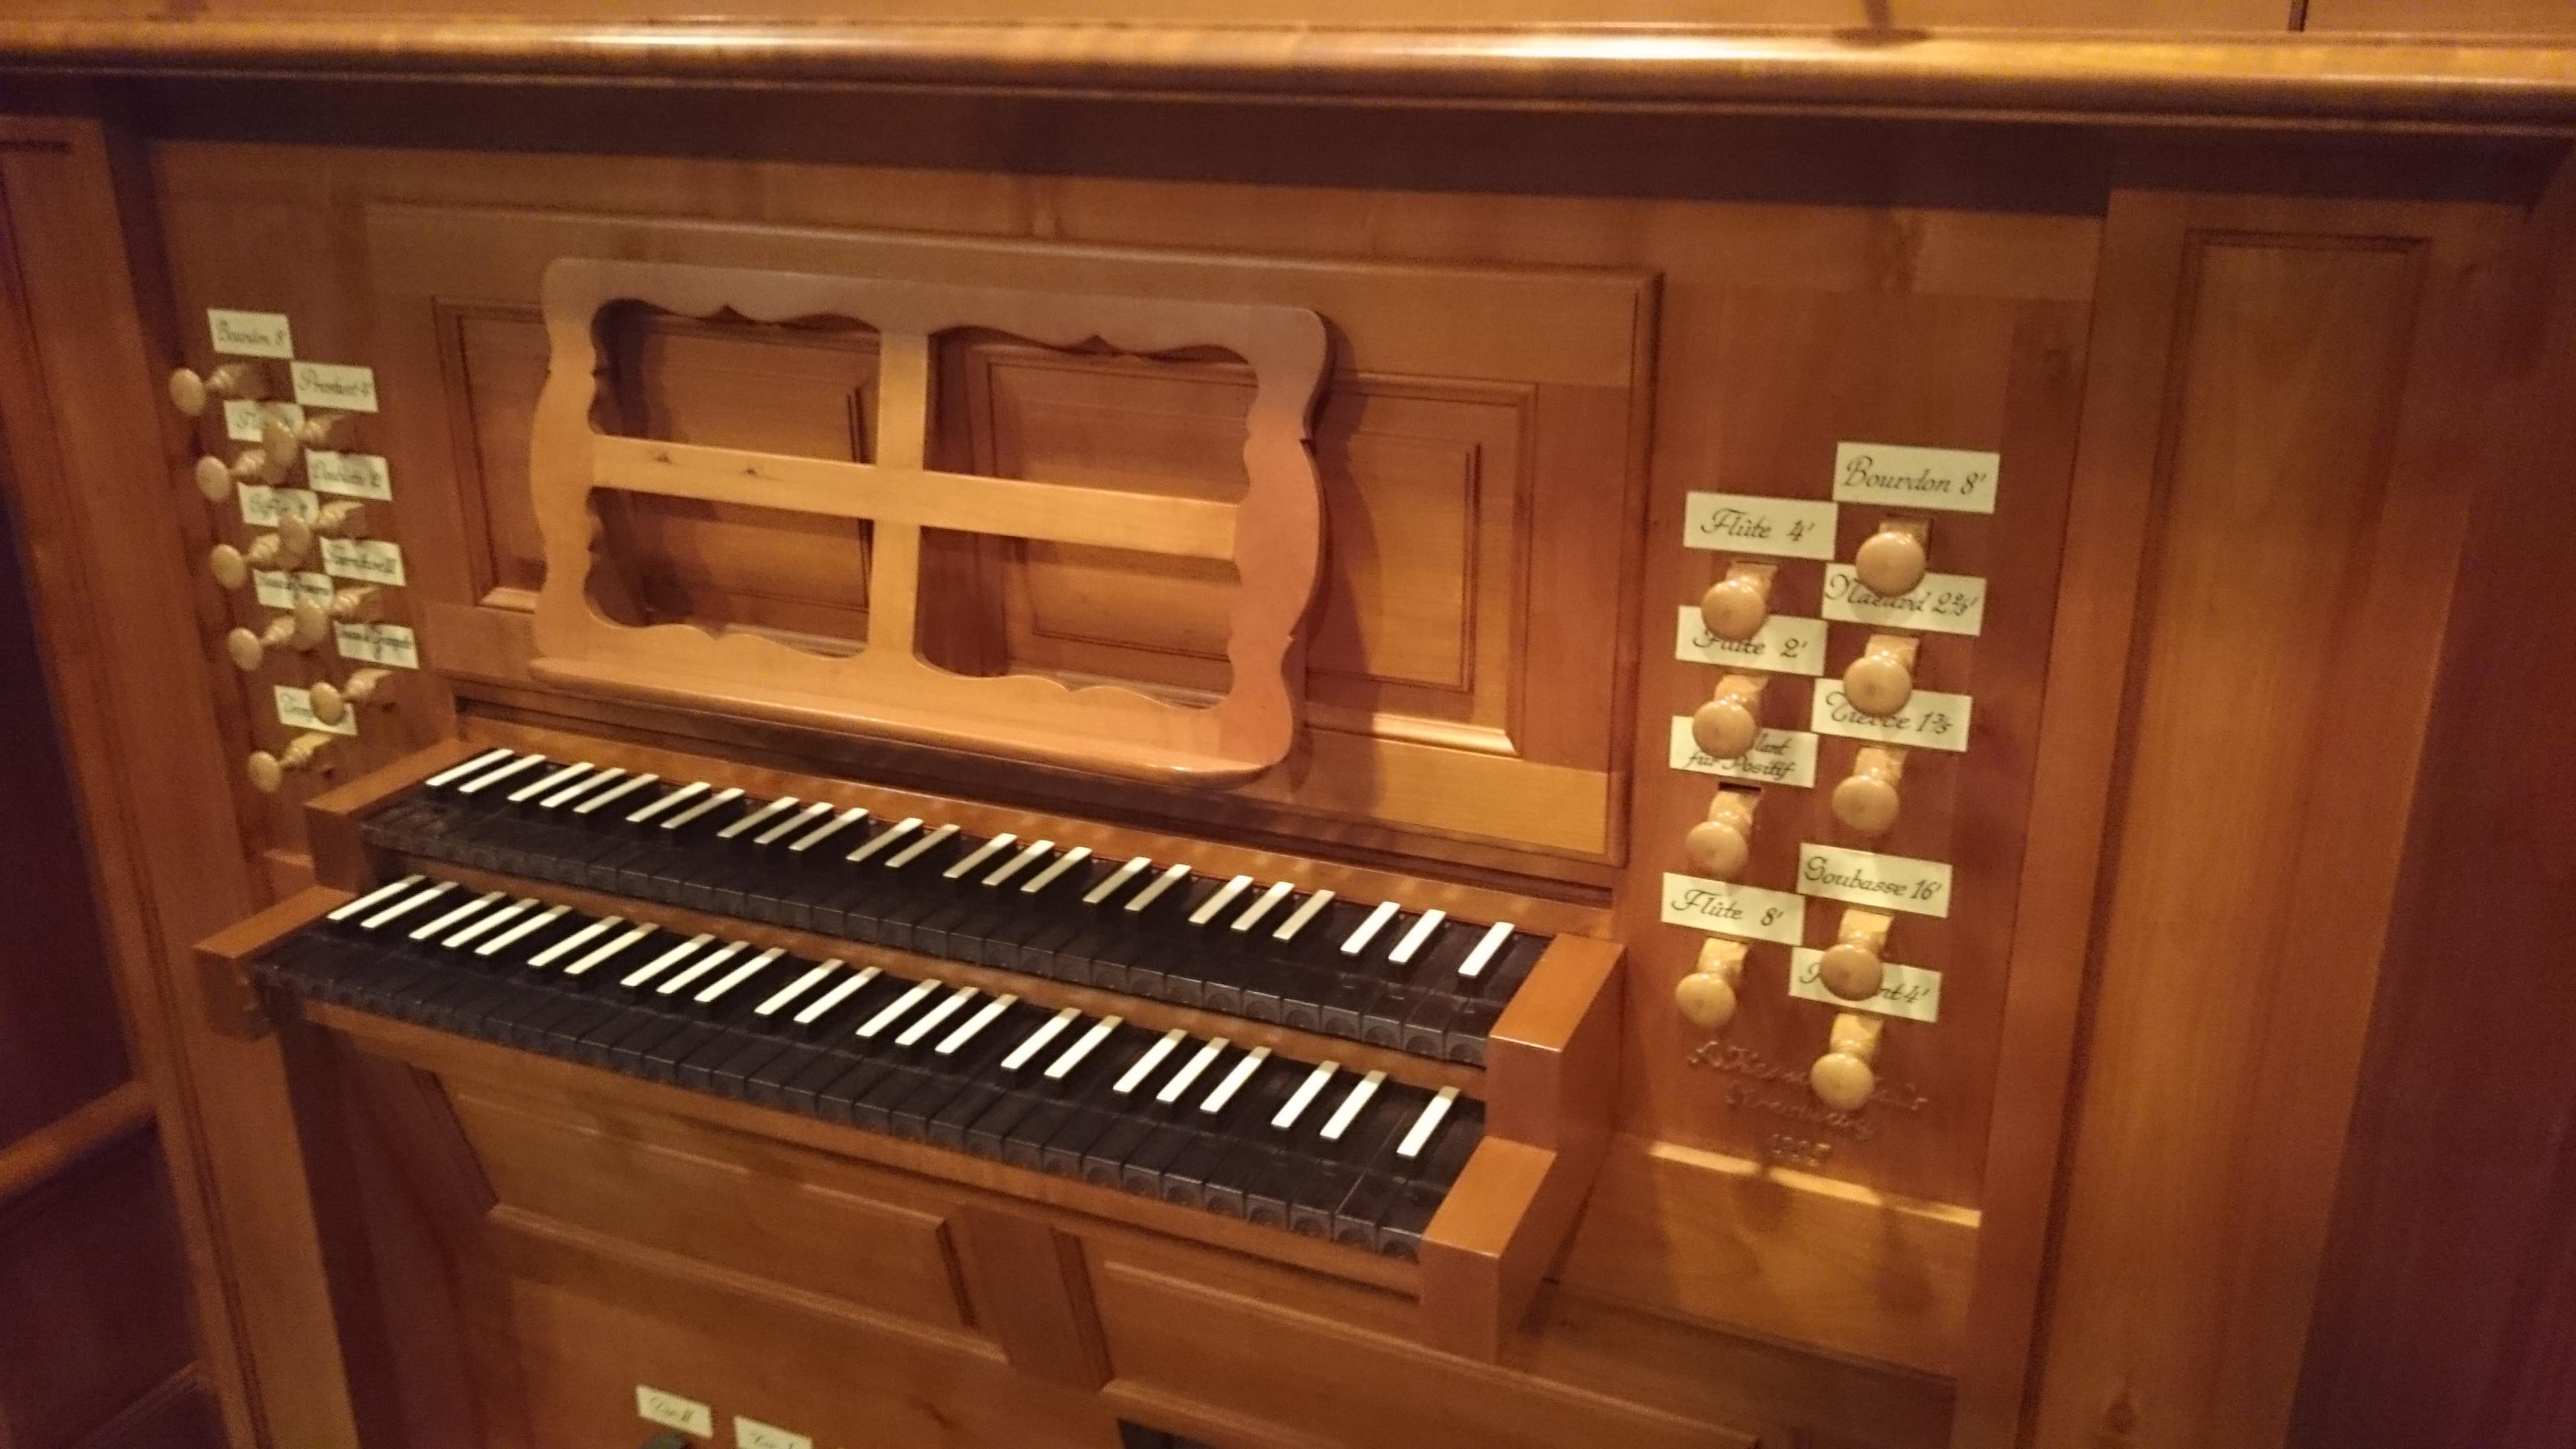 console, orgue de l'église de Sakuradai, Tokyo, Japon